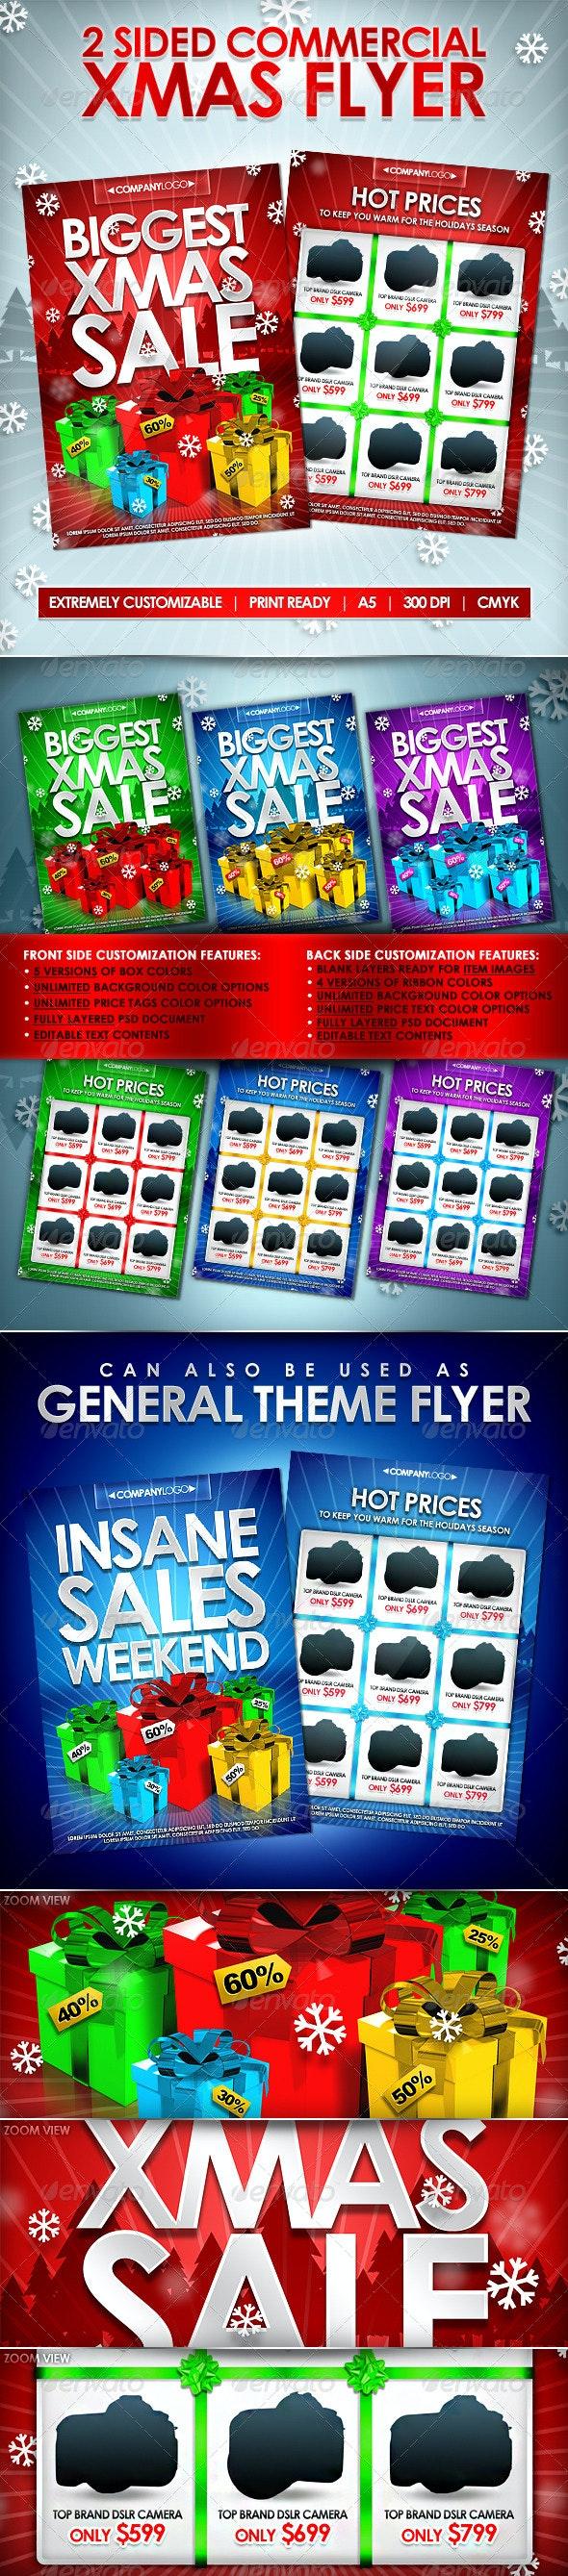 X-Mas Commercial Flyer - 2 Sides - Editable Colors - Commerce Flyers